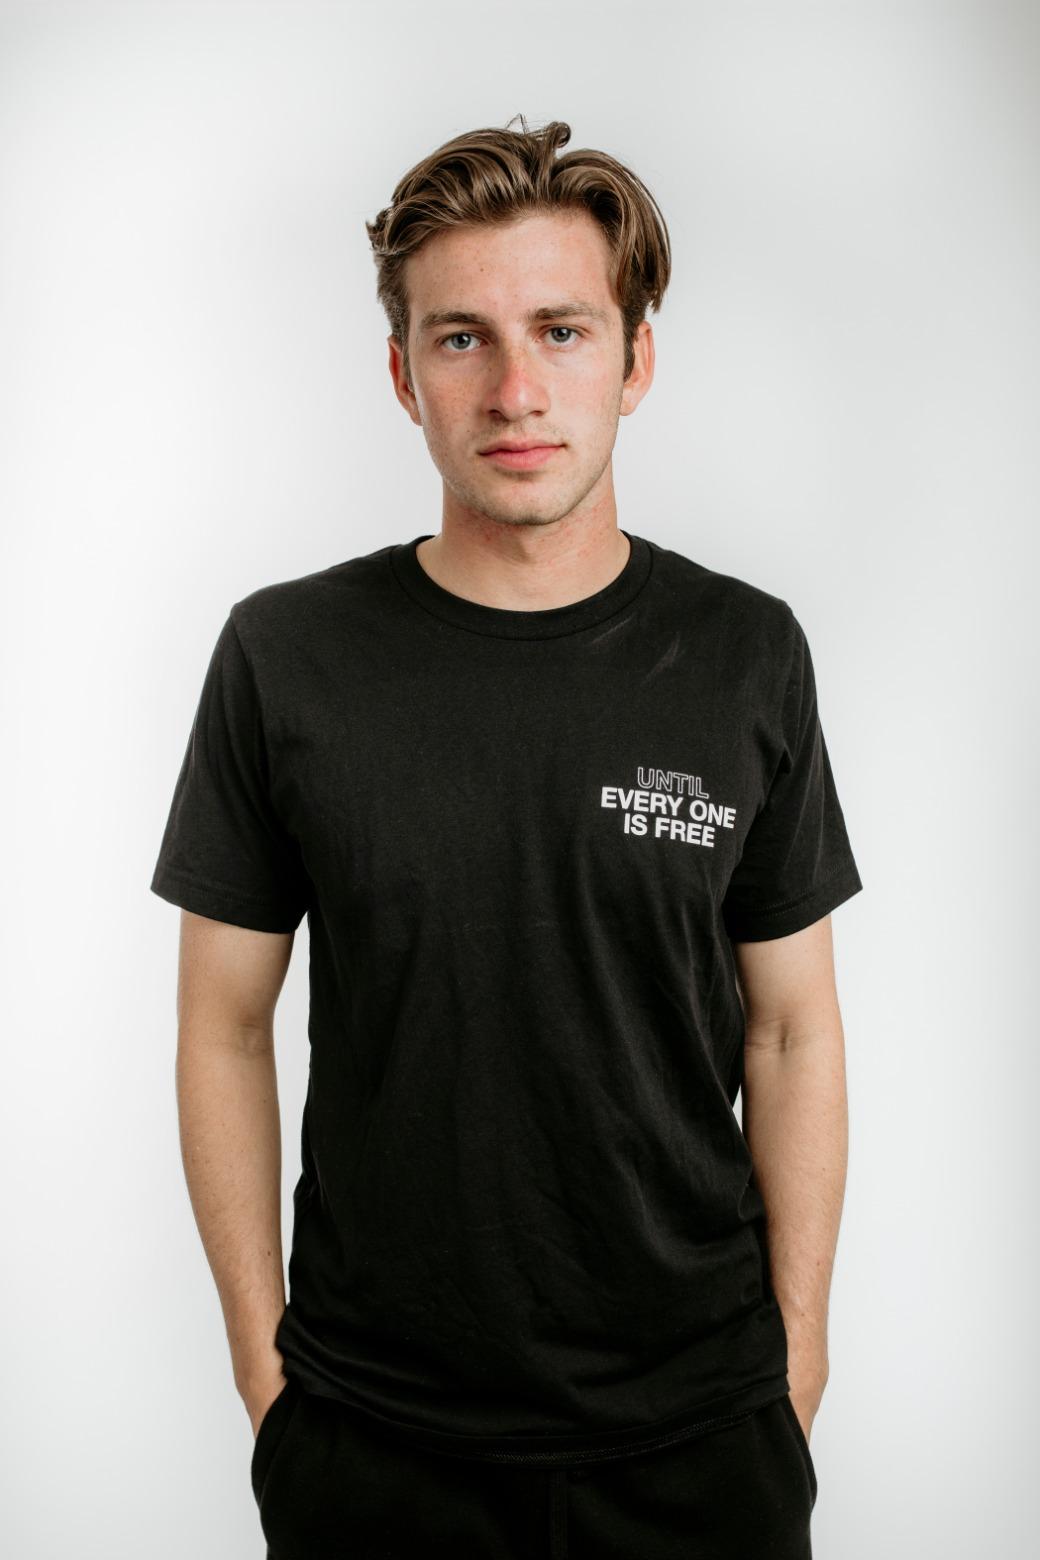 Black Until EveryONE is Free - T-Shirt 1